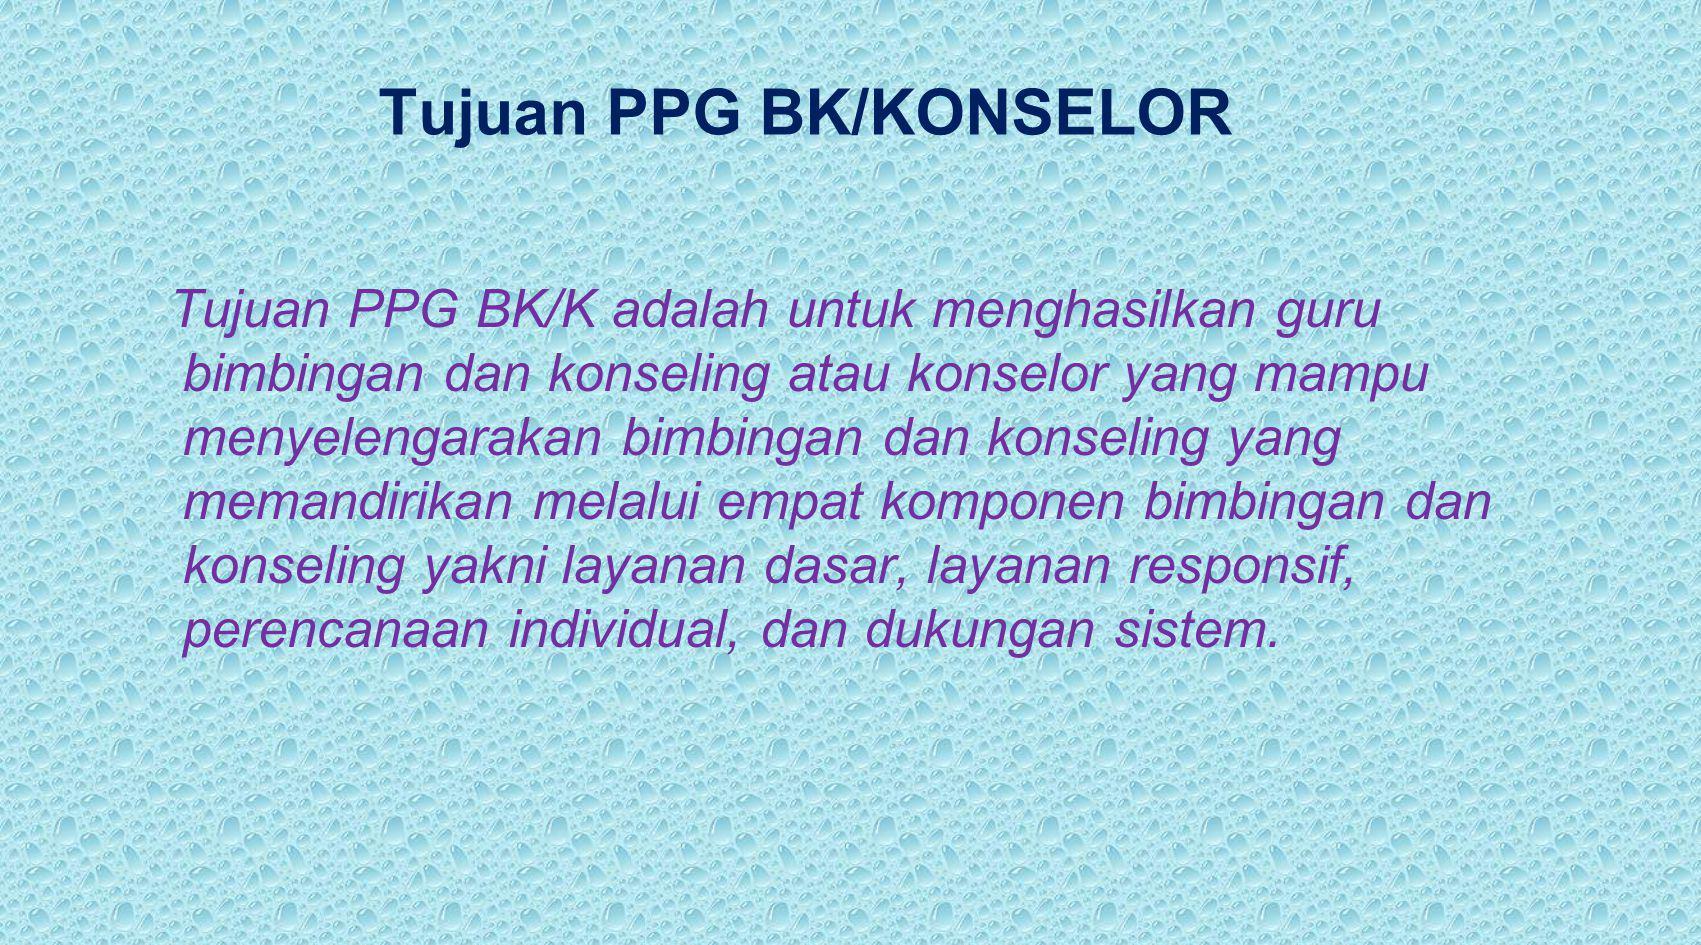 Tujuan PPG BK/KONSELOR